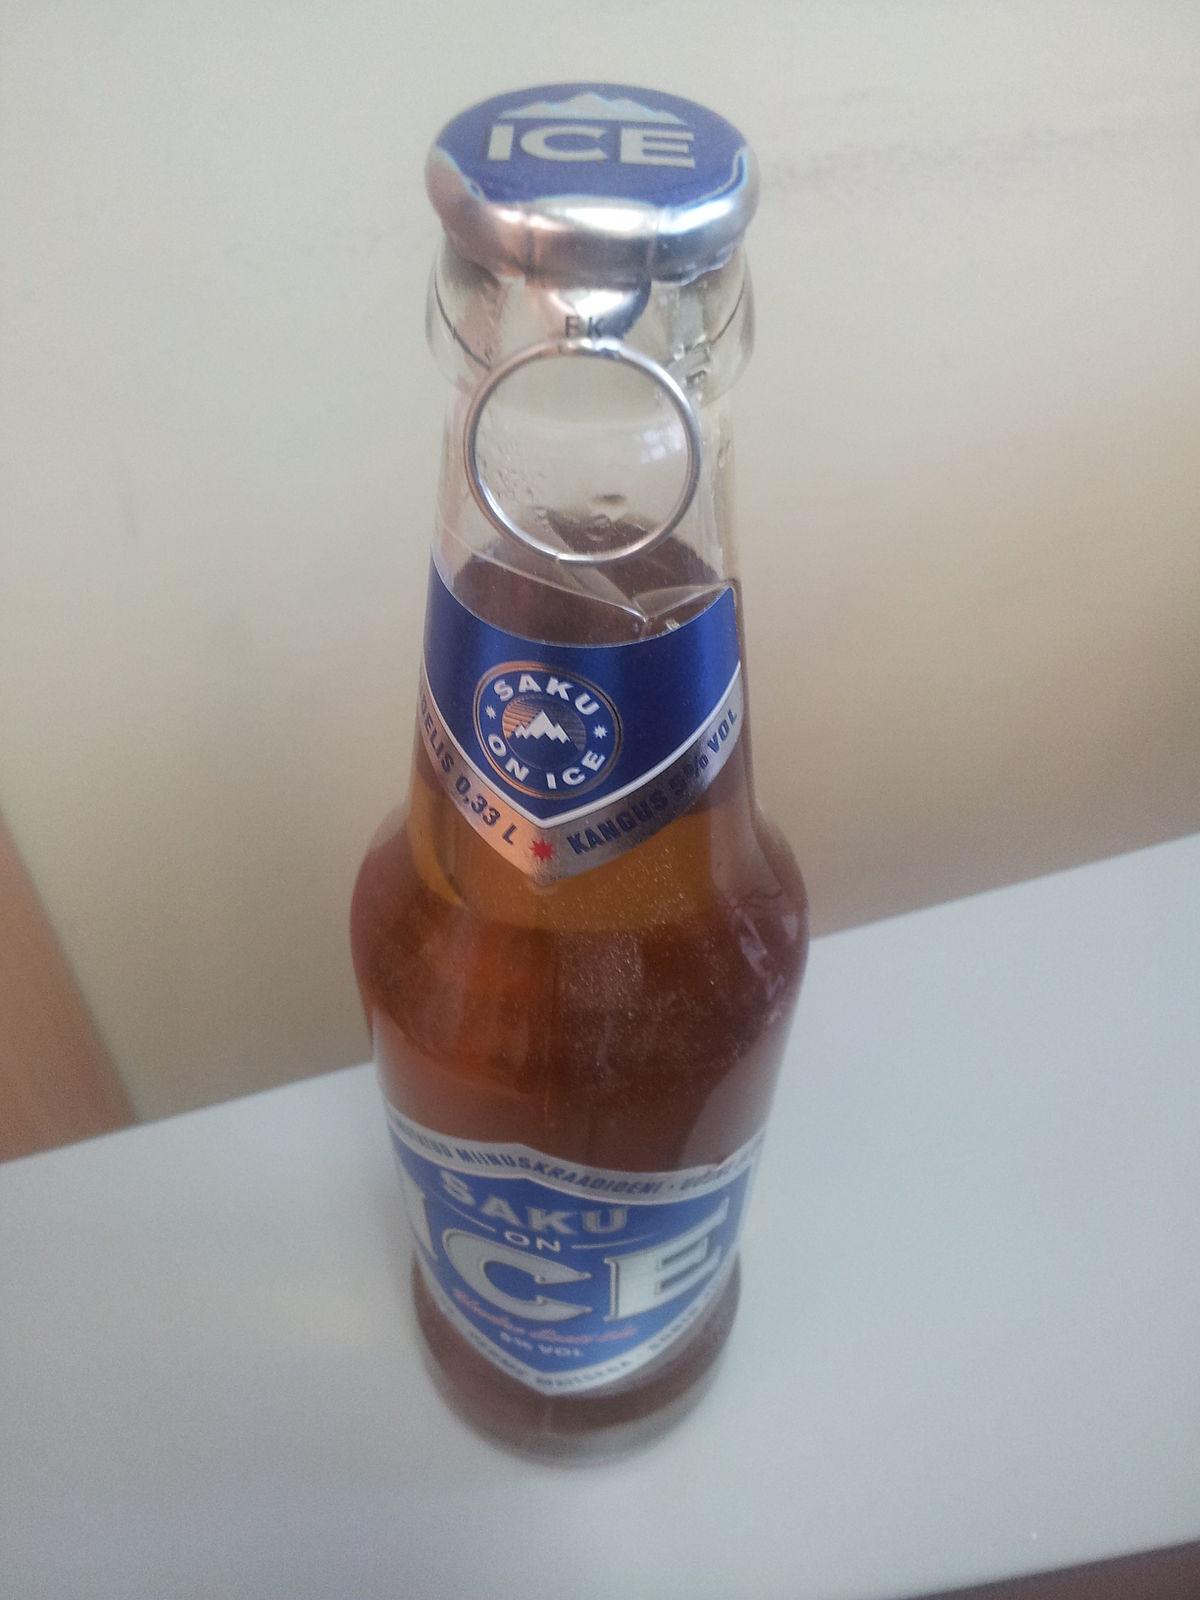 Pull-off bottle cap